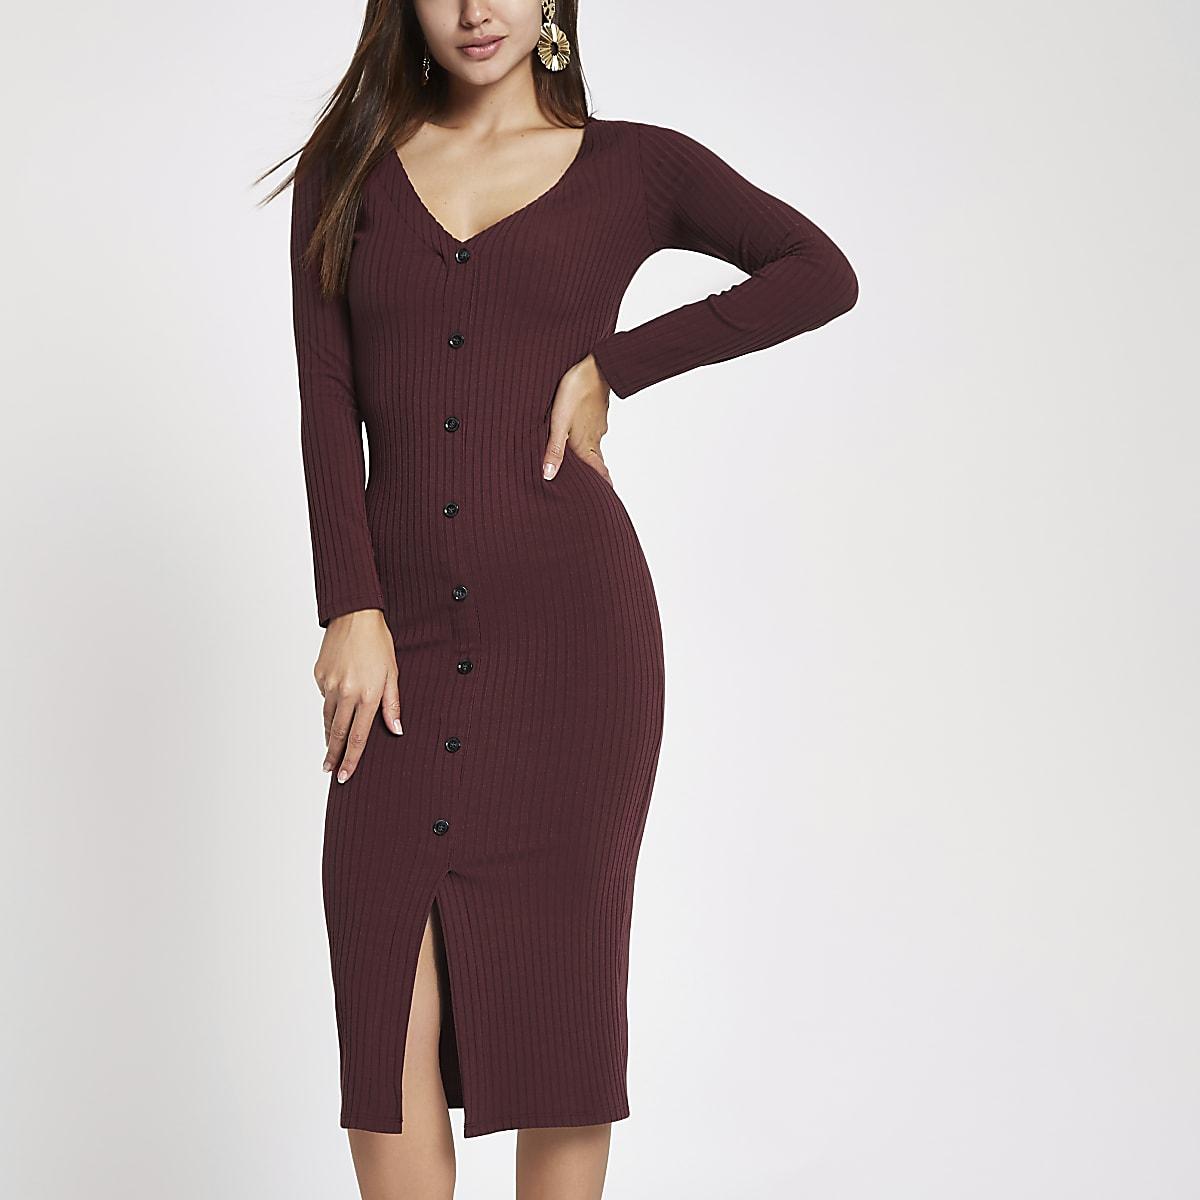 e442ecf4e1a93 Dark red ribbed button front bodycon dress - Bodycon Dresses - Dresses -  women